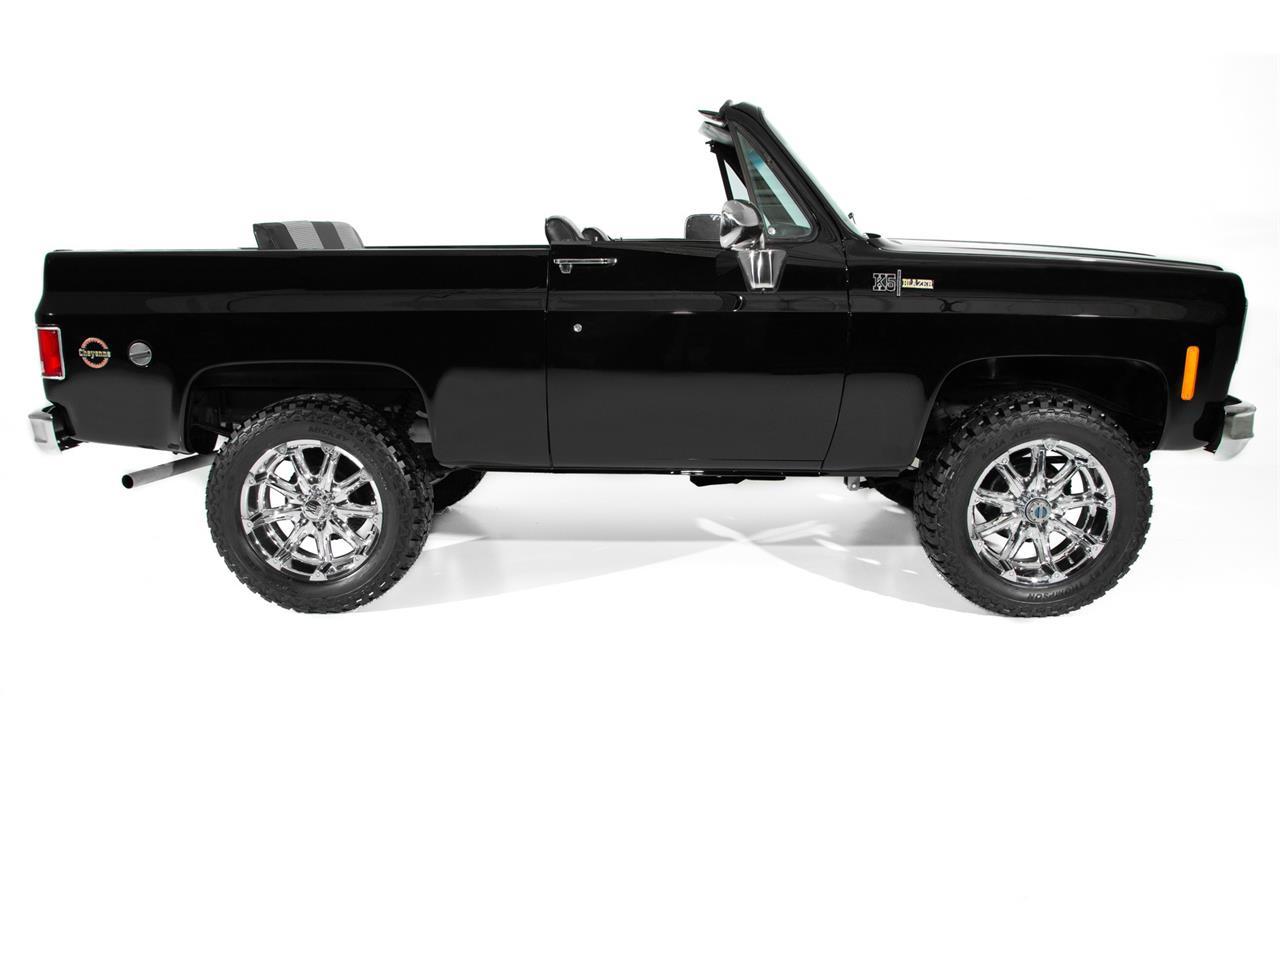 1975 Chevrolet Blazer for sale in Des Moines, IA ...